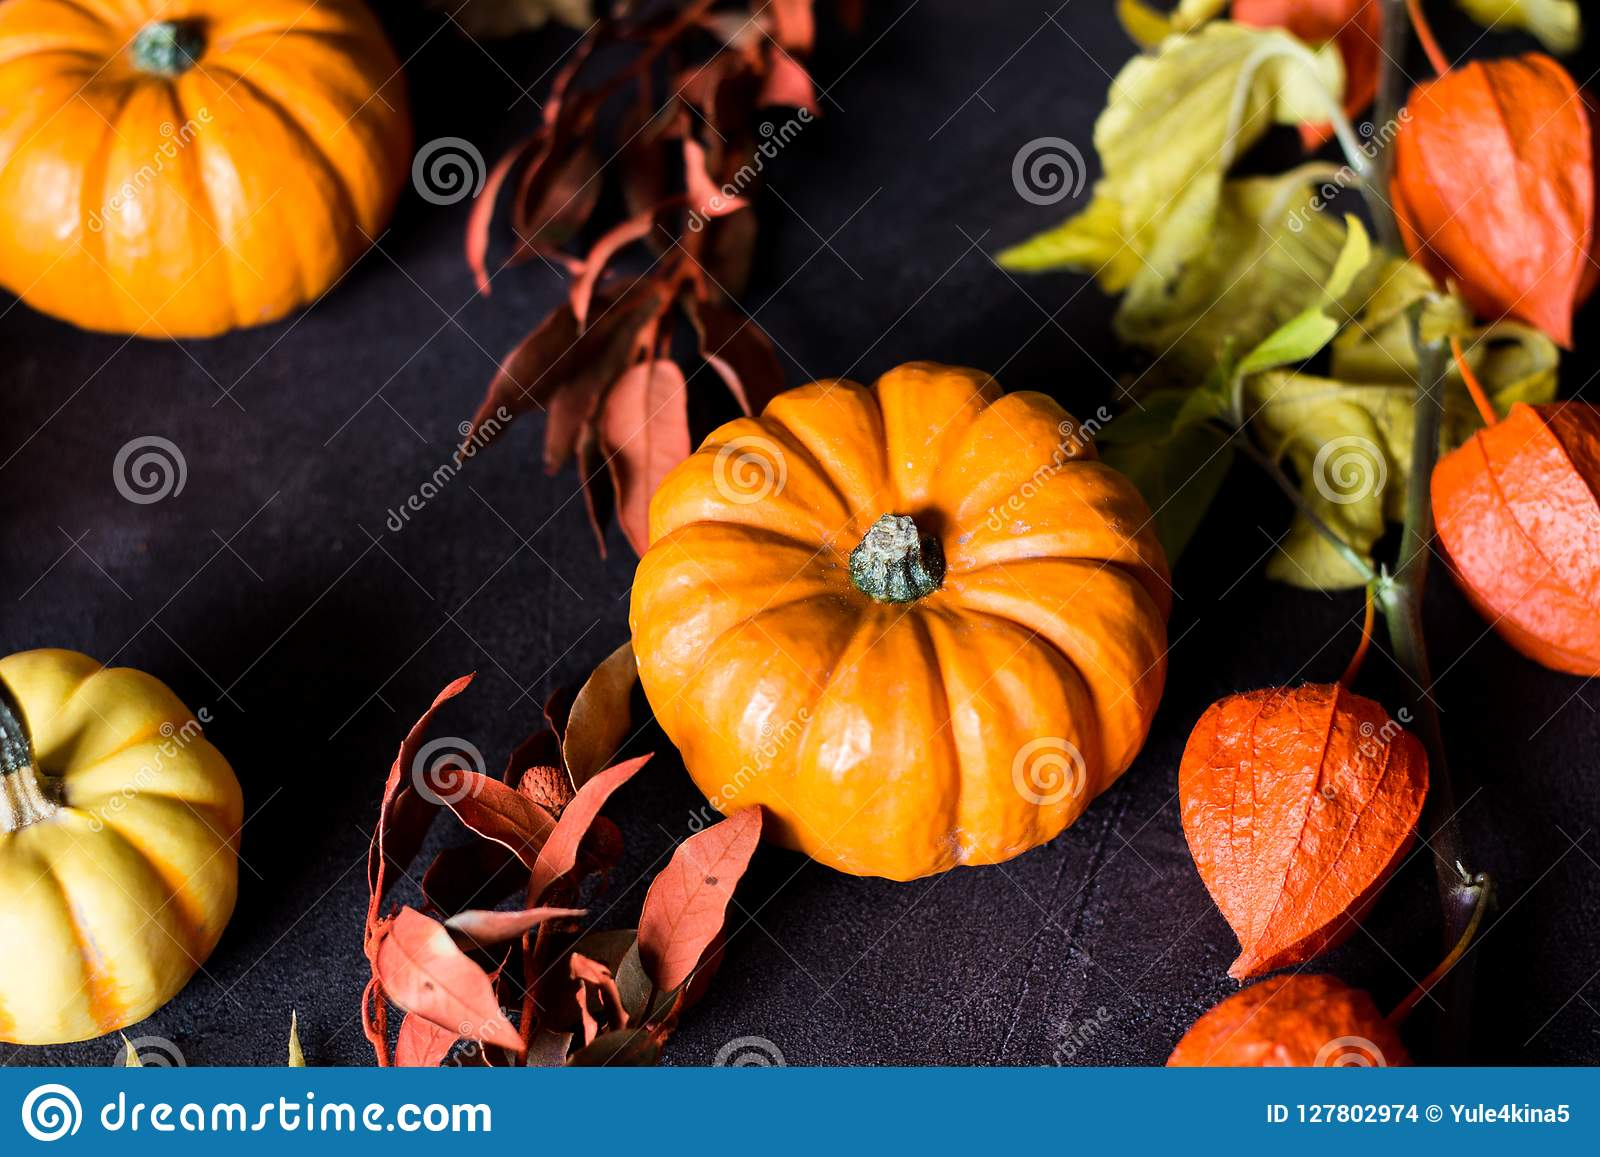 Bright orange mini pumpkins for halloween on black background